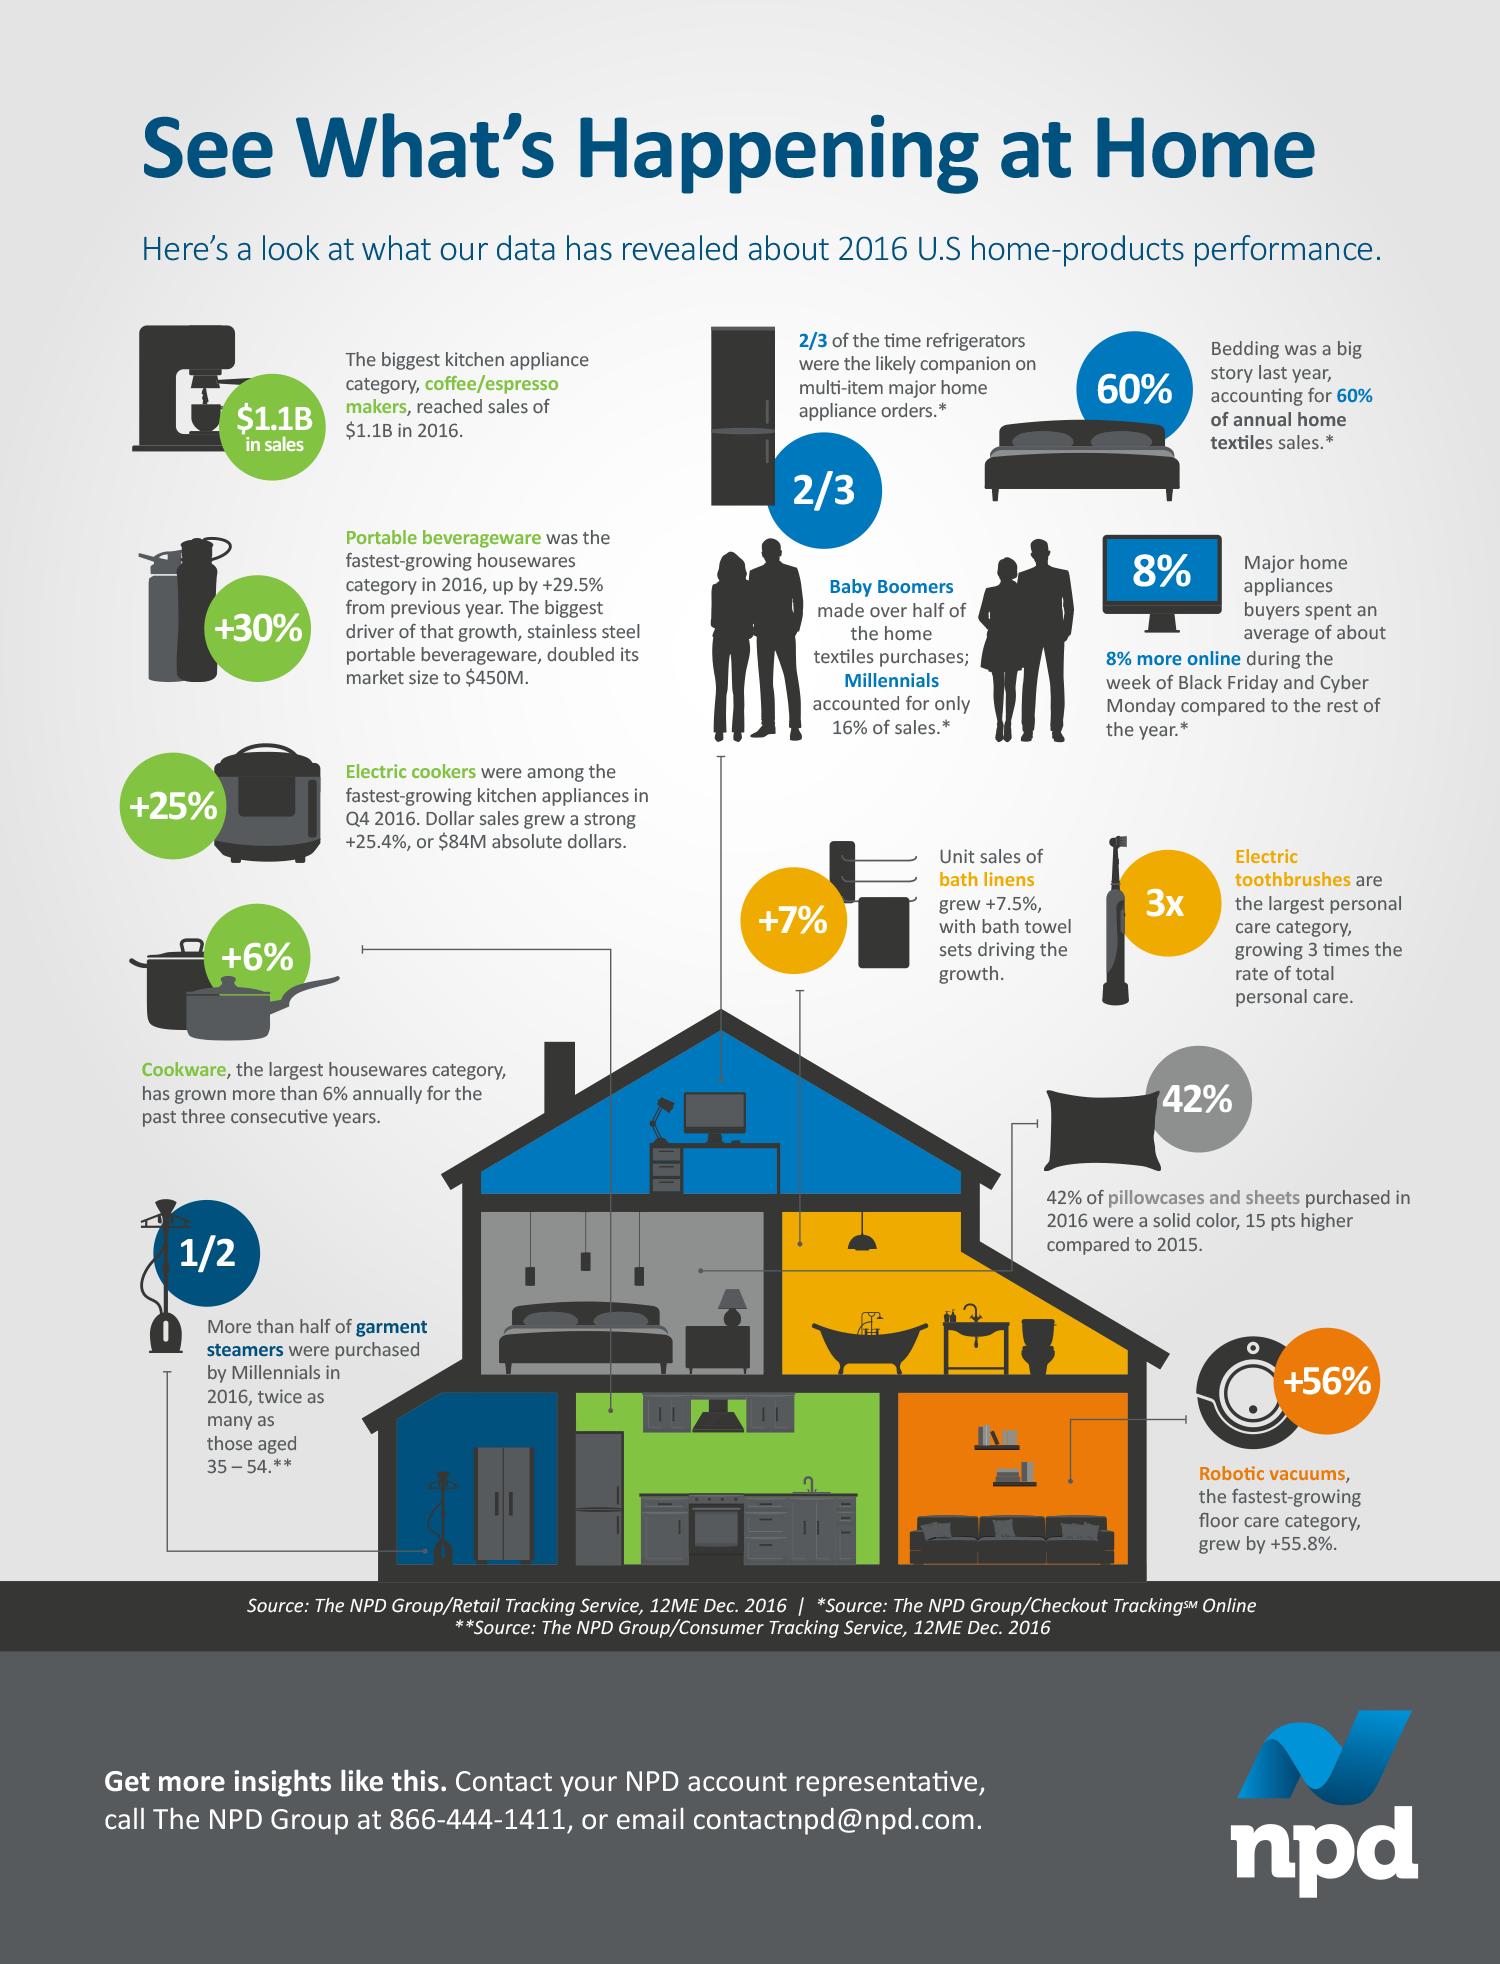 Appliances Tips Home Infographic Aplusappliancesllc Home Textile The Unit Personal Care